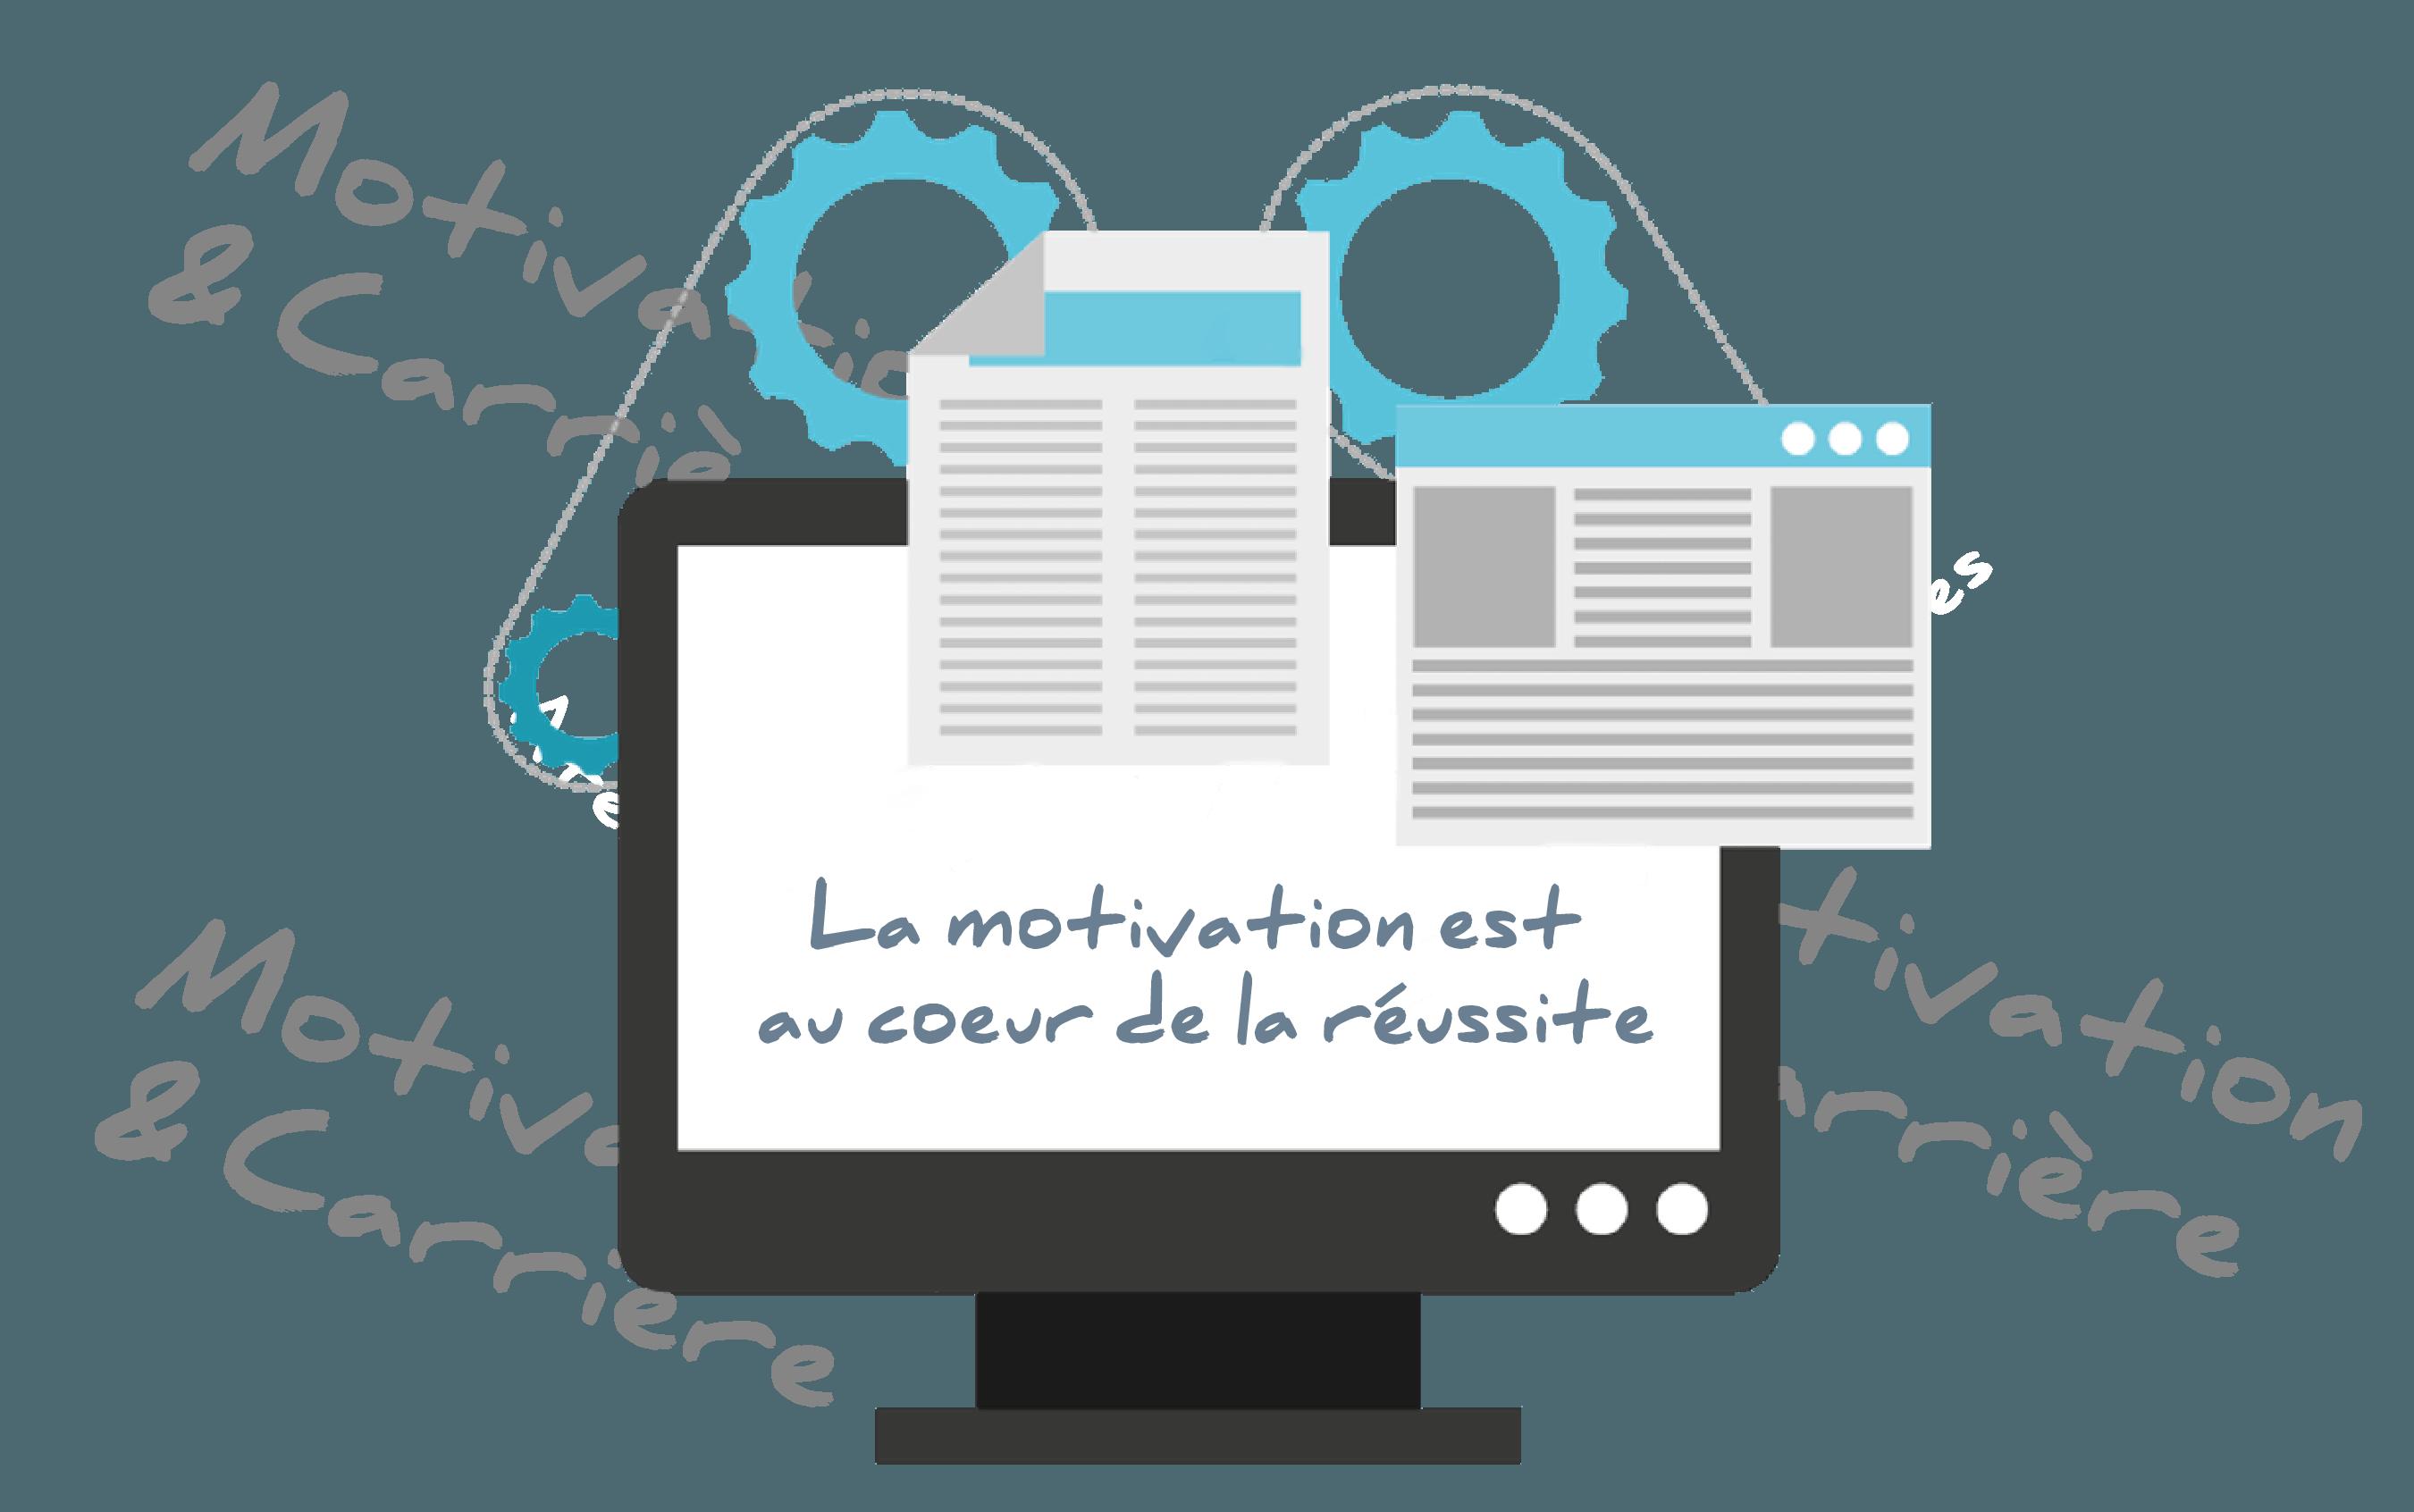 /outils-pour-evoluer/#motiva